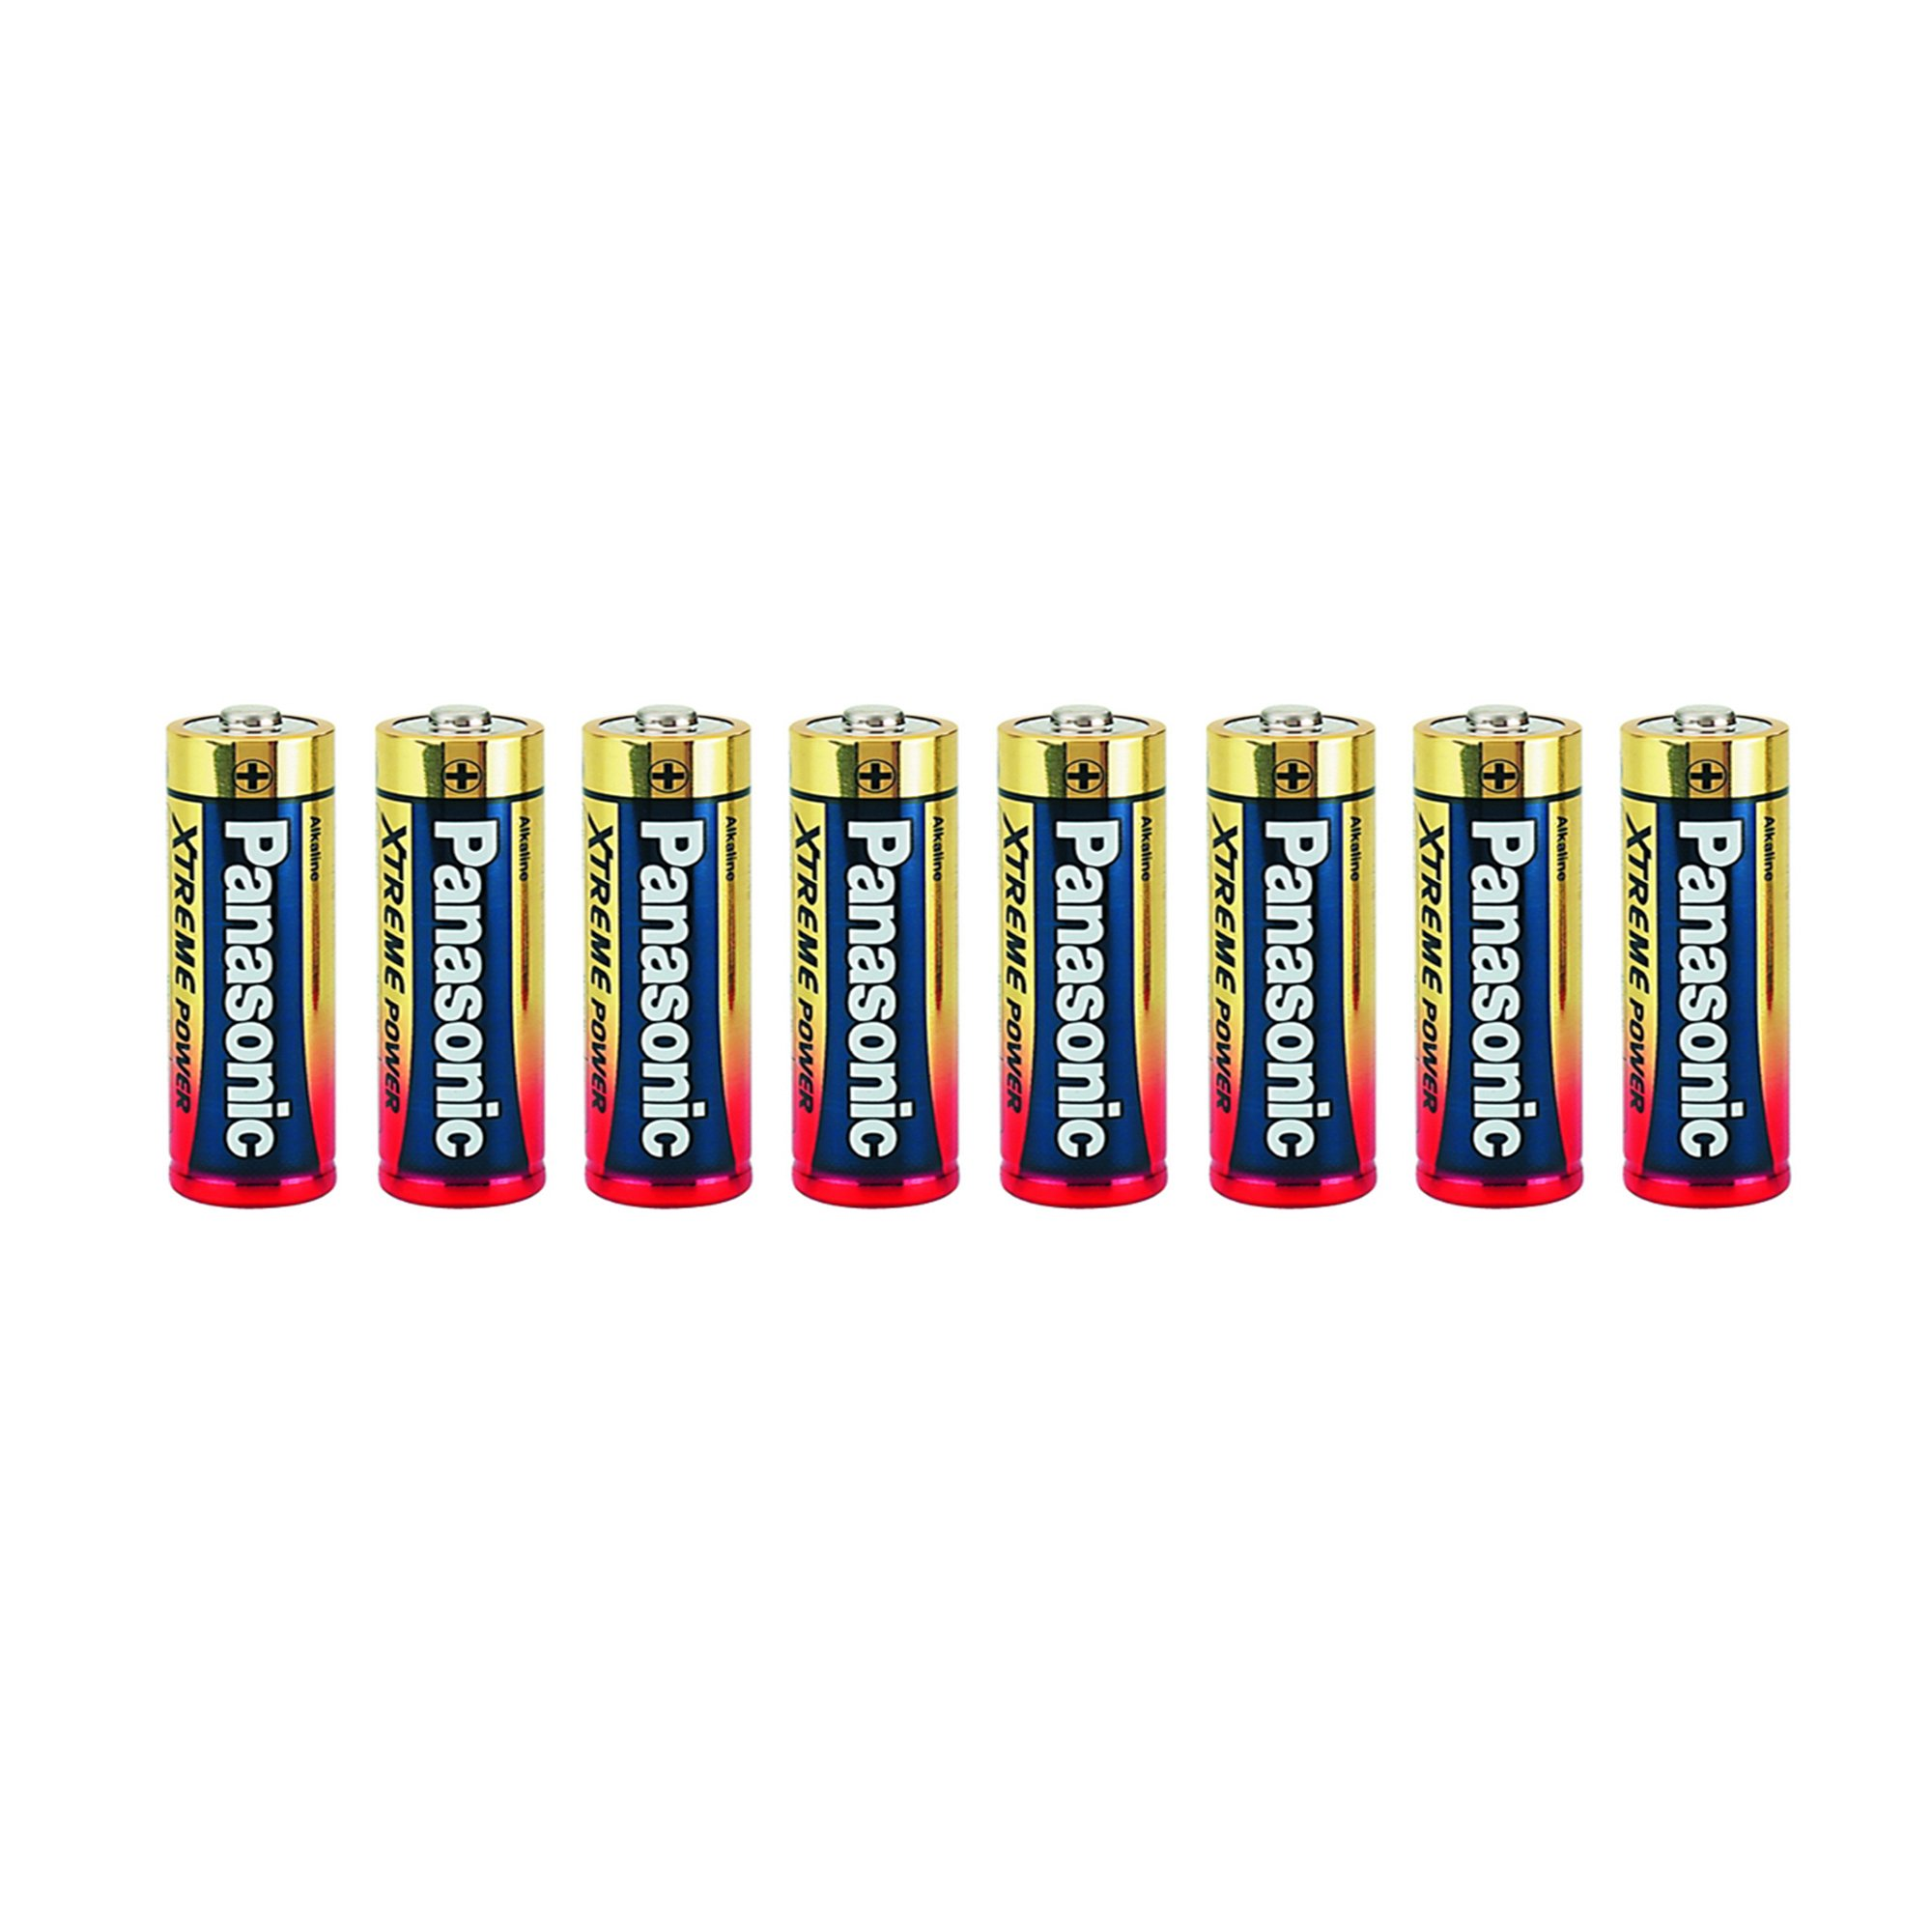 Designtorget Batteri AA 8-pack